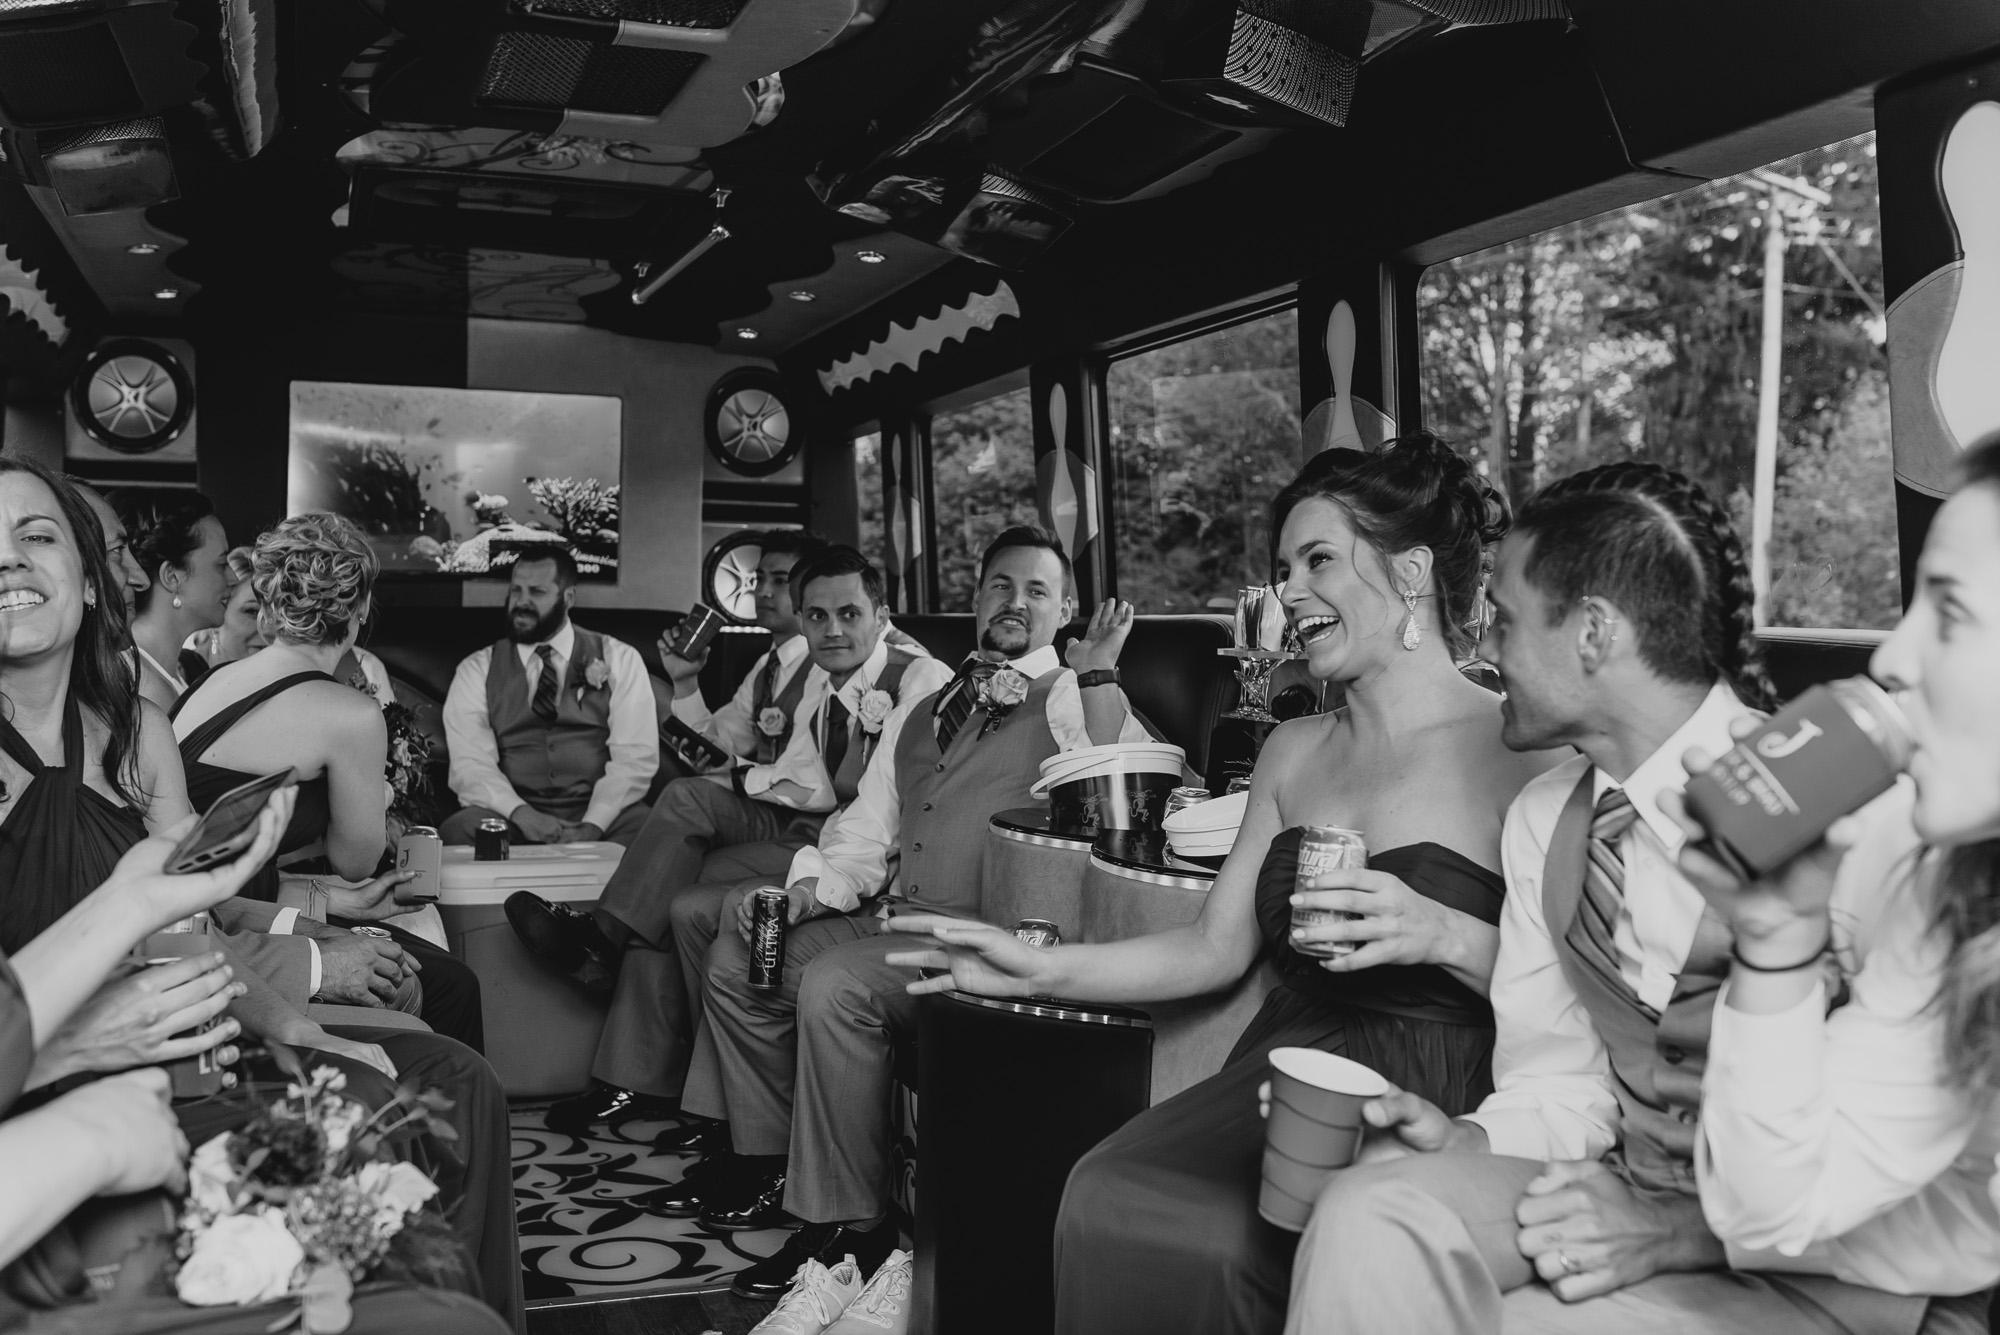 prairie-street-brewhouse-wedding-Rockford-IL-wedding-photographers-191.jpg